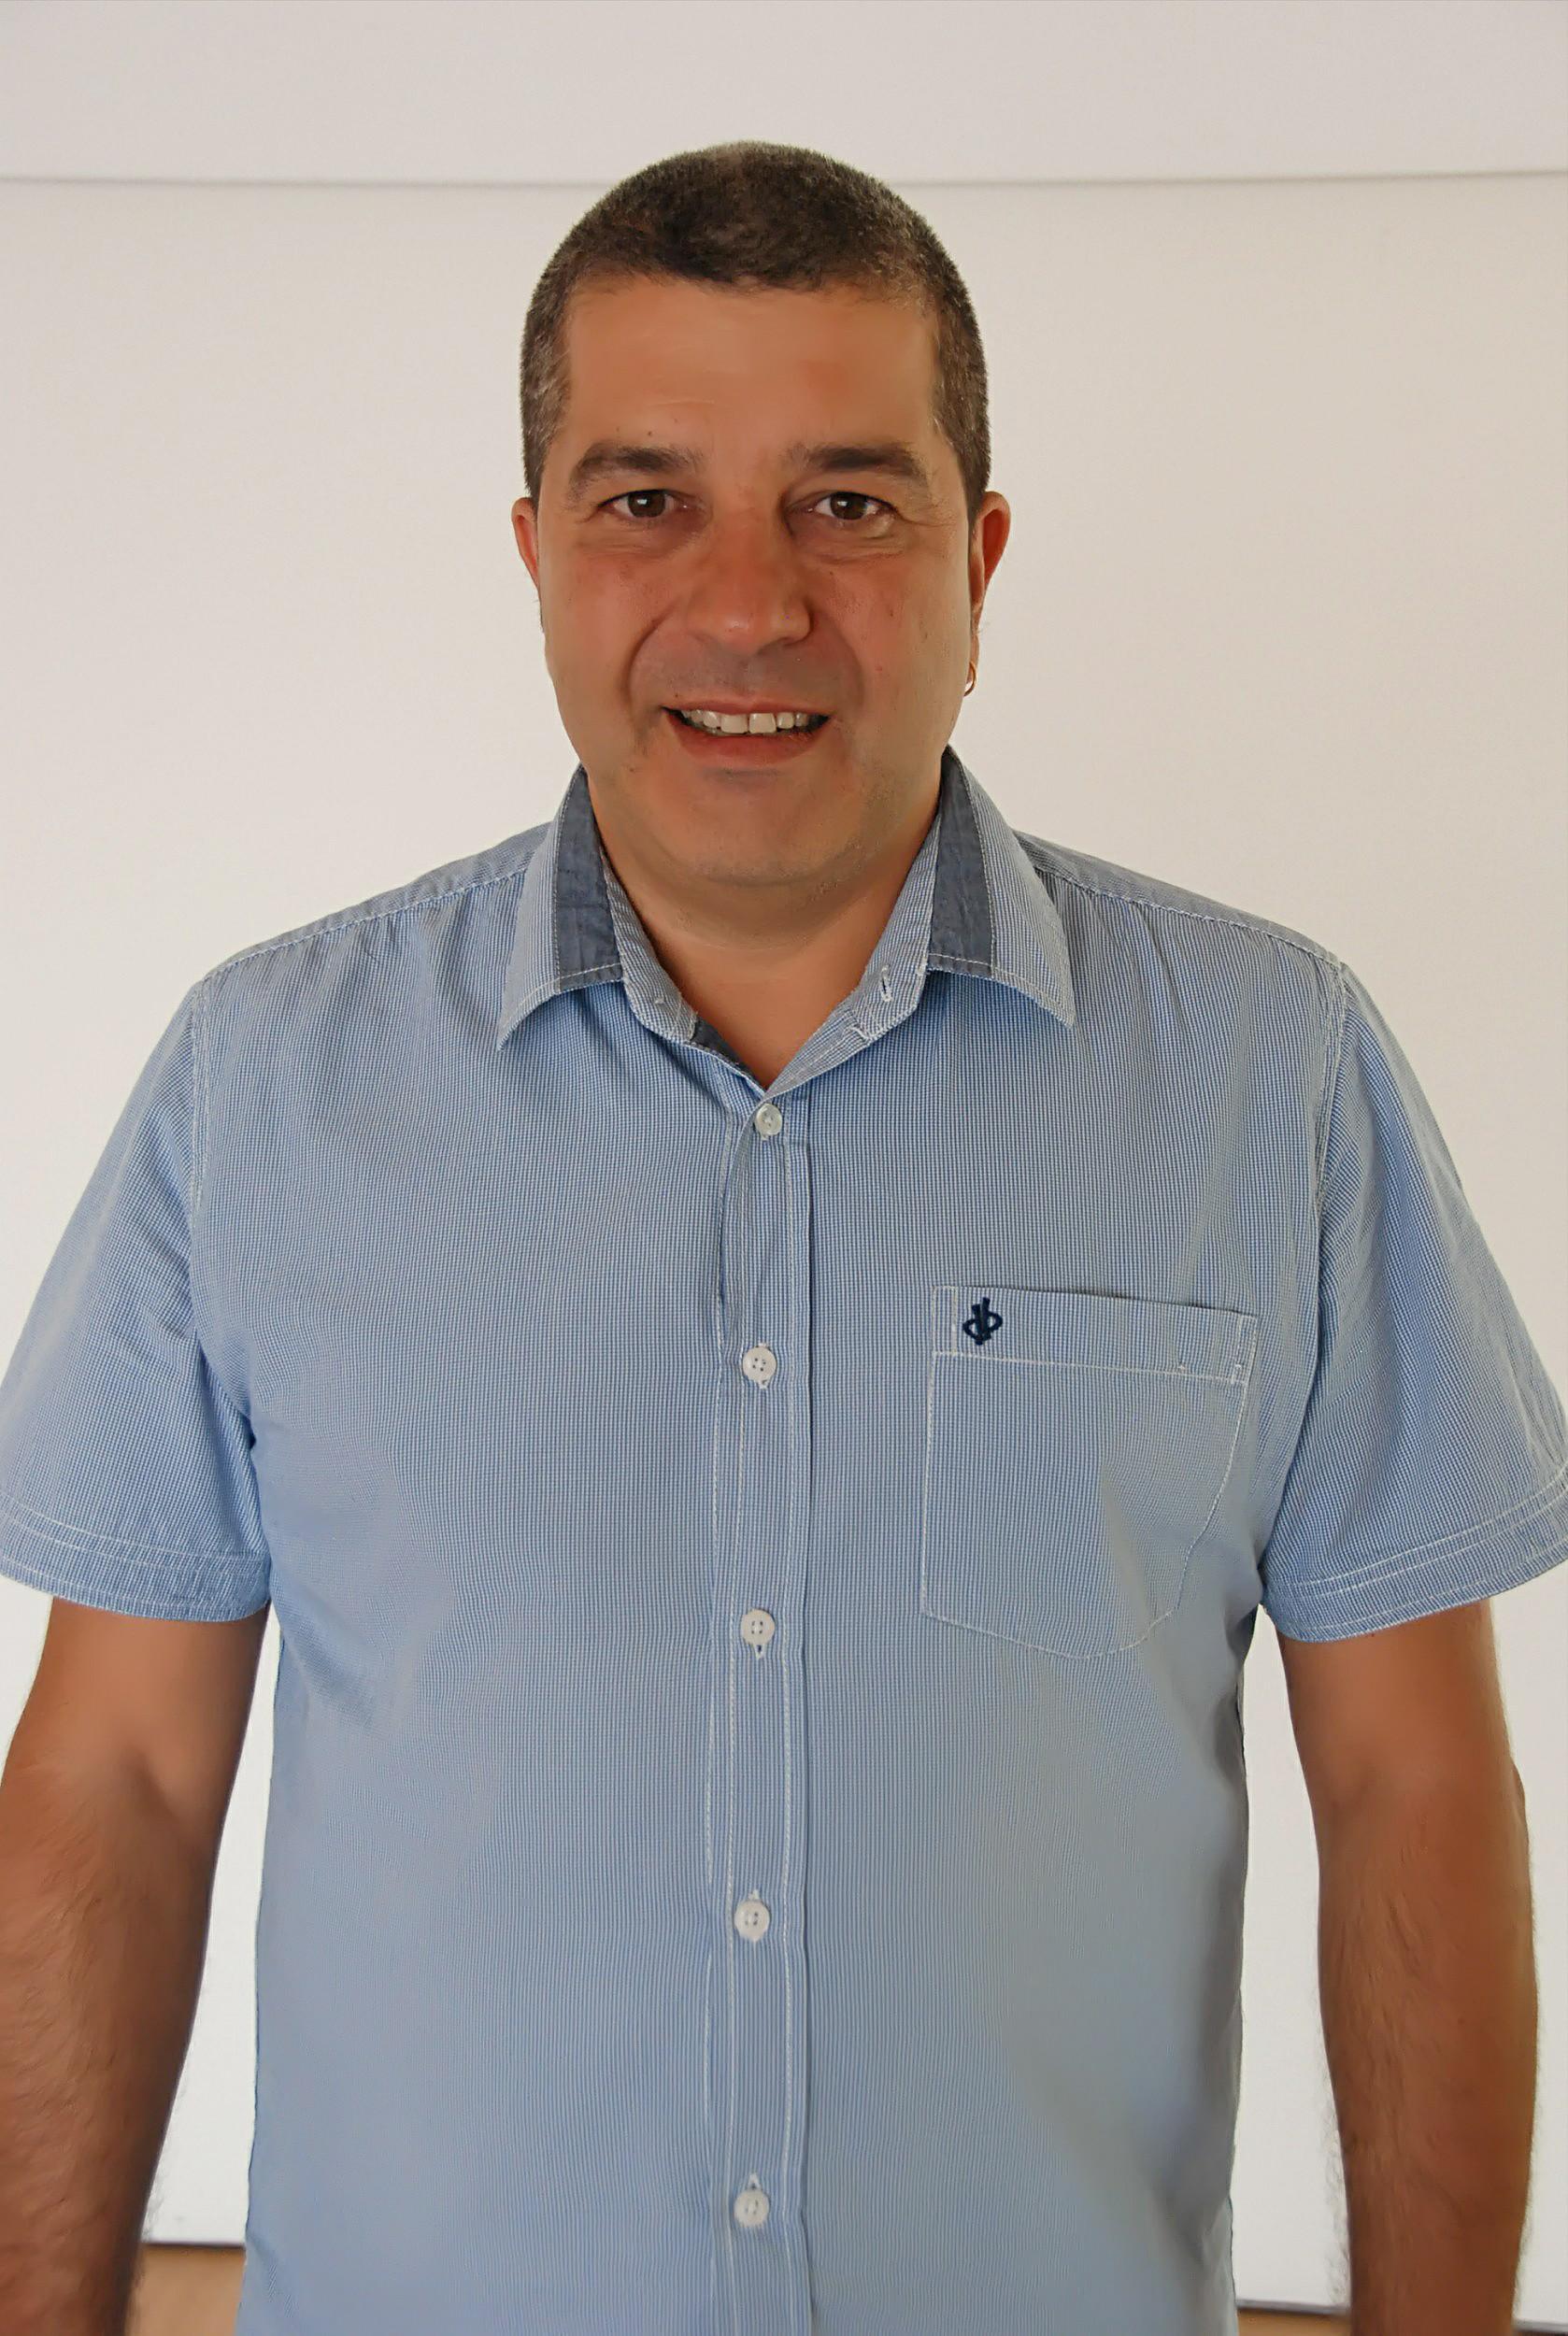 Álex Cruz Armendáriz